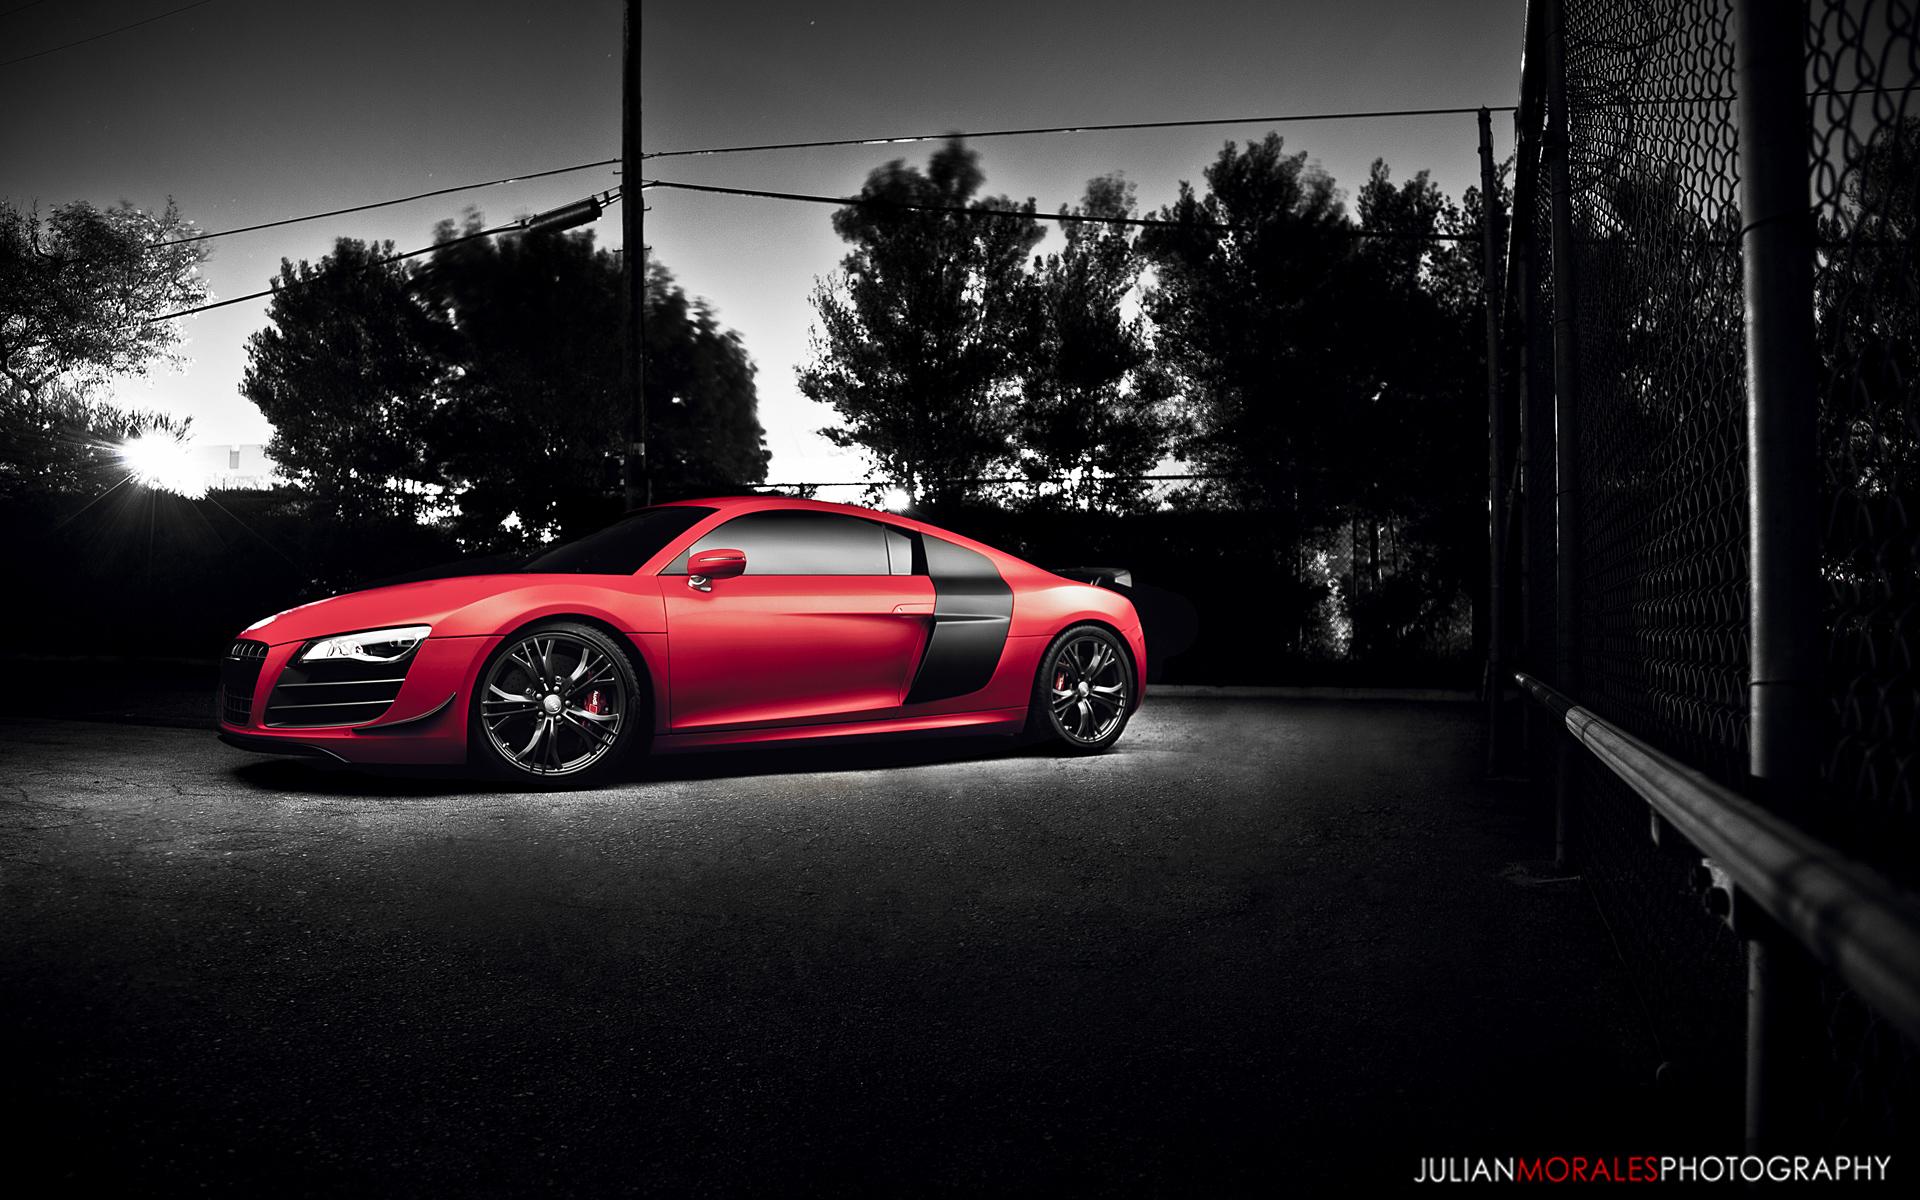 Audi R8 Wallpaper Iphone 6 Audi R8 Gt 6 Wallpaper Hd Car Wallpapers Id 2598